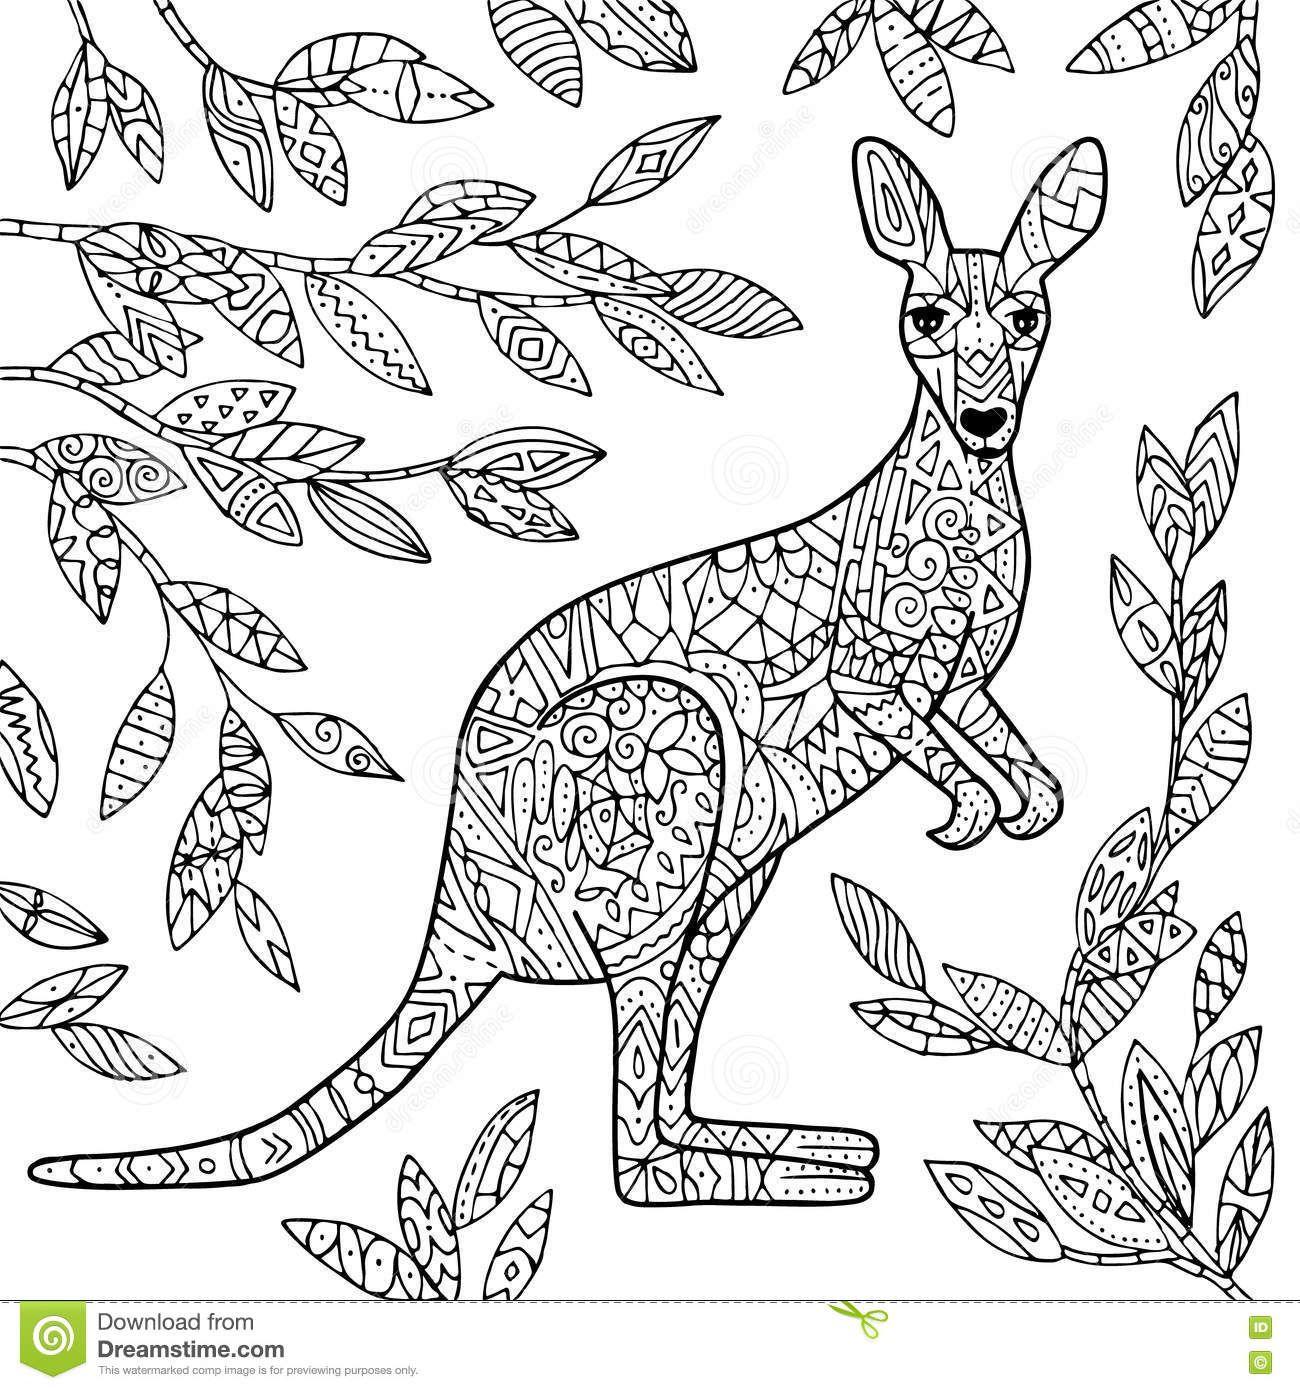 Pin By Barbara On Coloring Kangaroo Ostrich Kangaroo Illustration Kangaroo Art Kangaroo Drawing